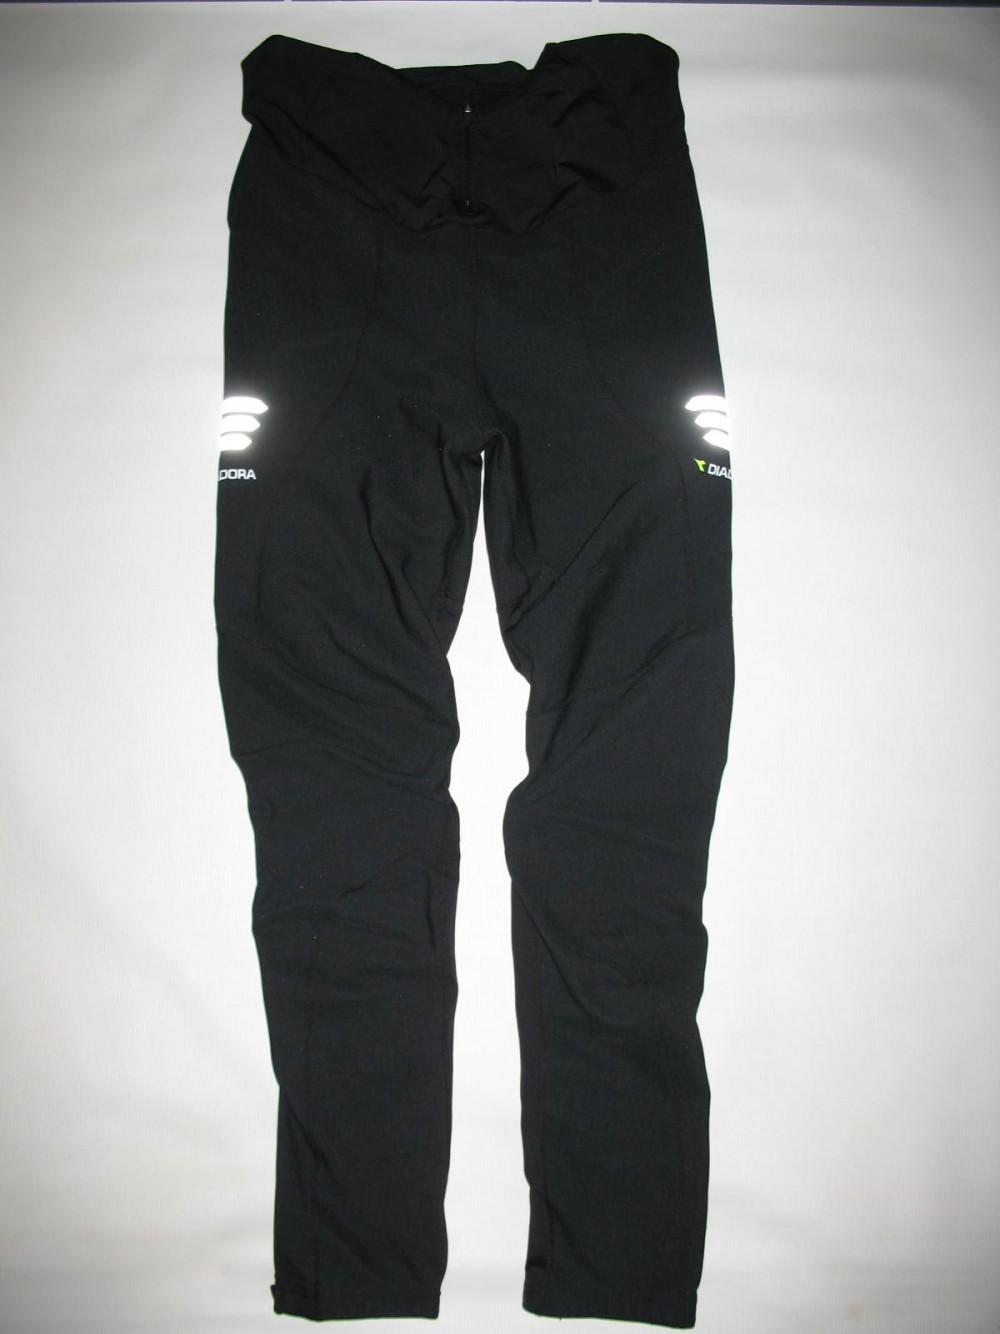 Велобрюки DIADORA cycling windstopper bib pants(размер XL/реально L) - 1